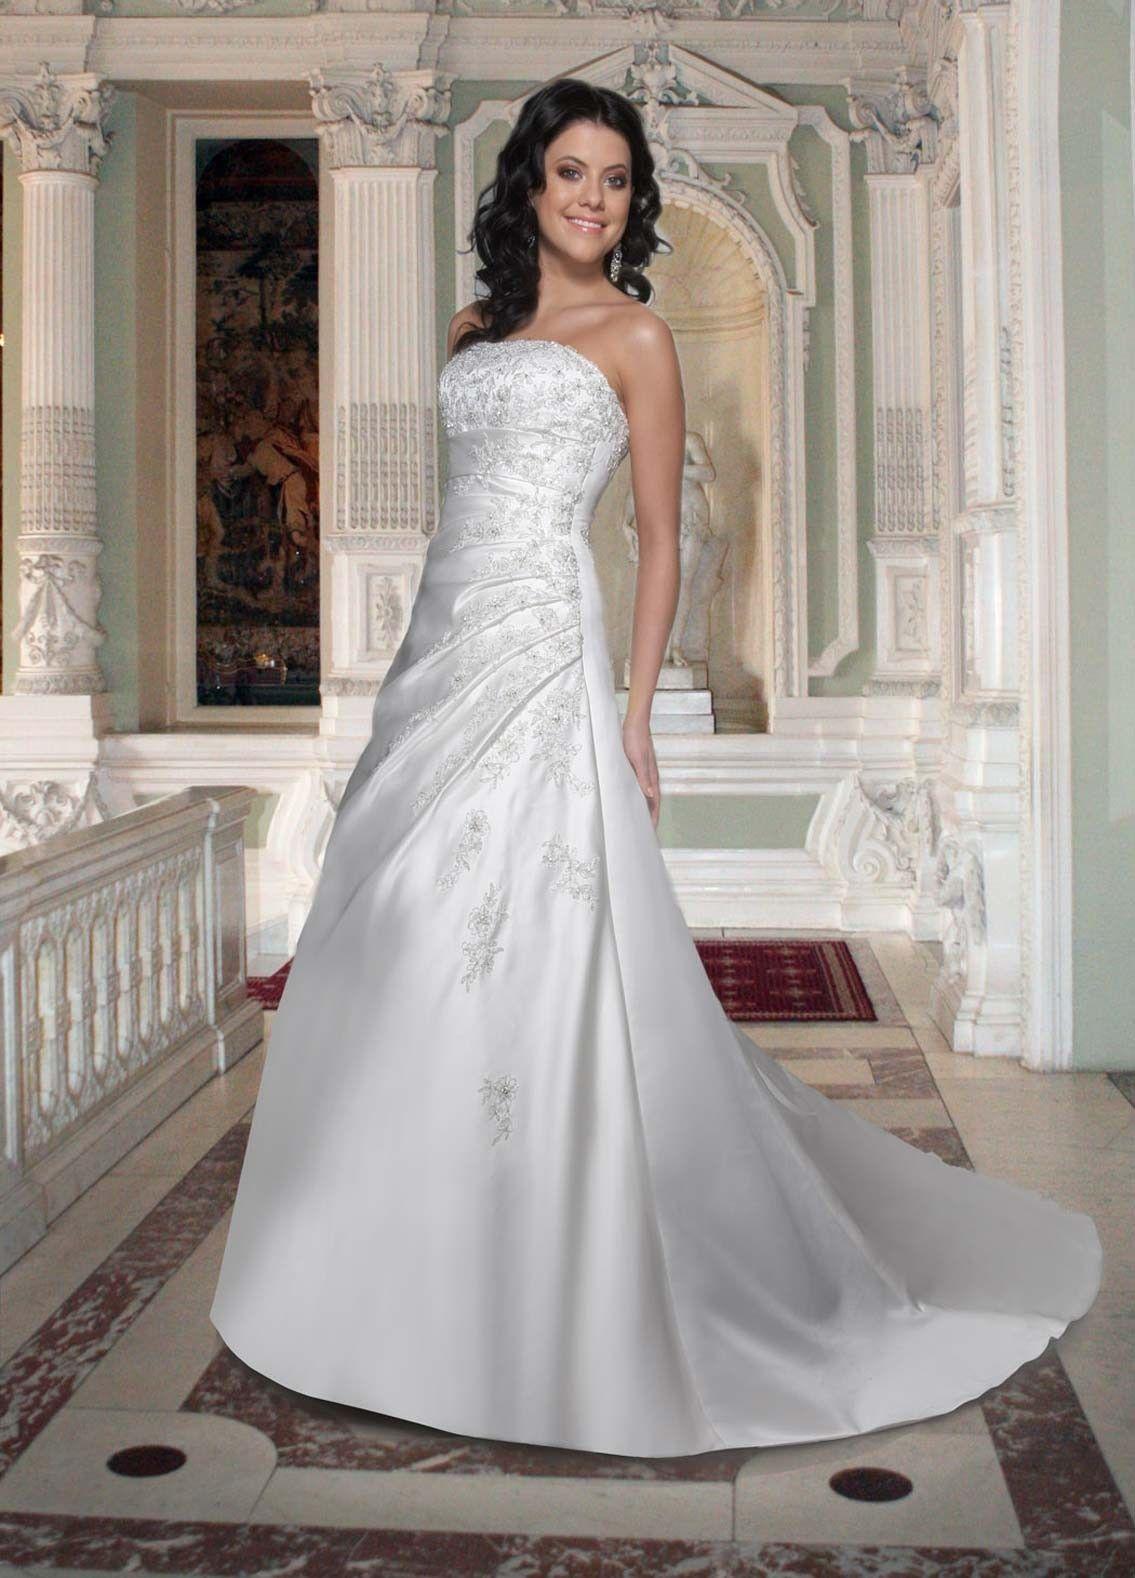 Satin A-Line Strapless Straight Neckline Corset back Wedding Dress ...